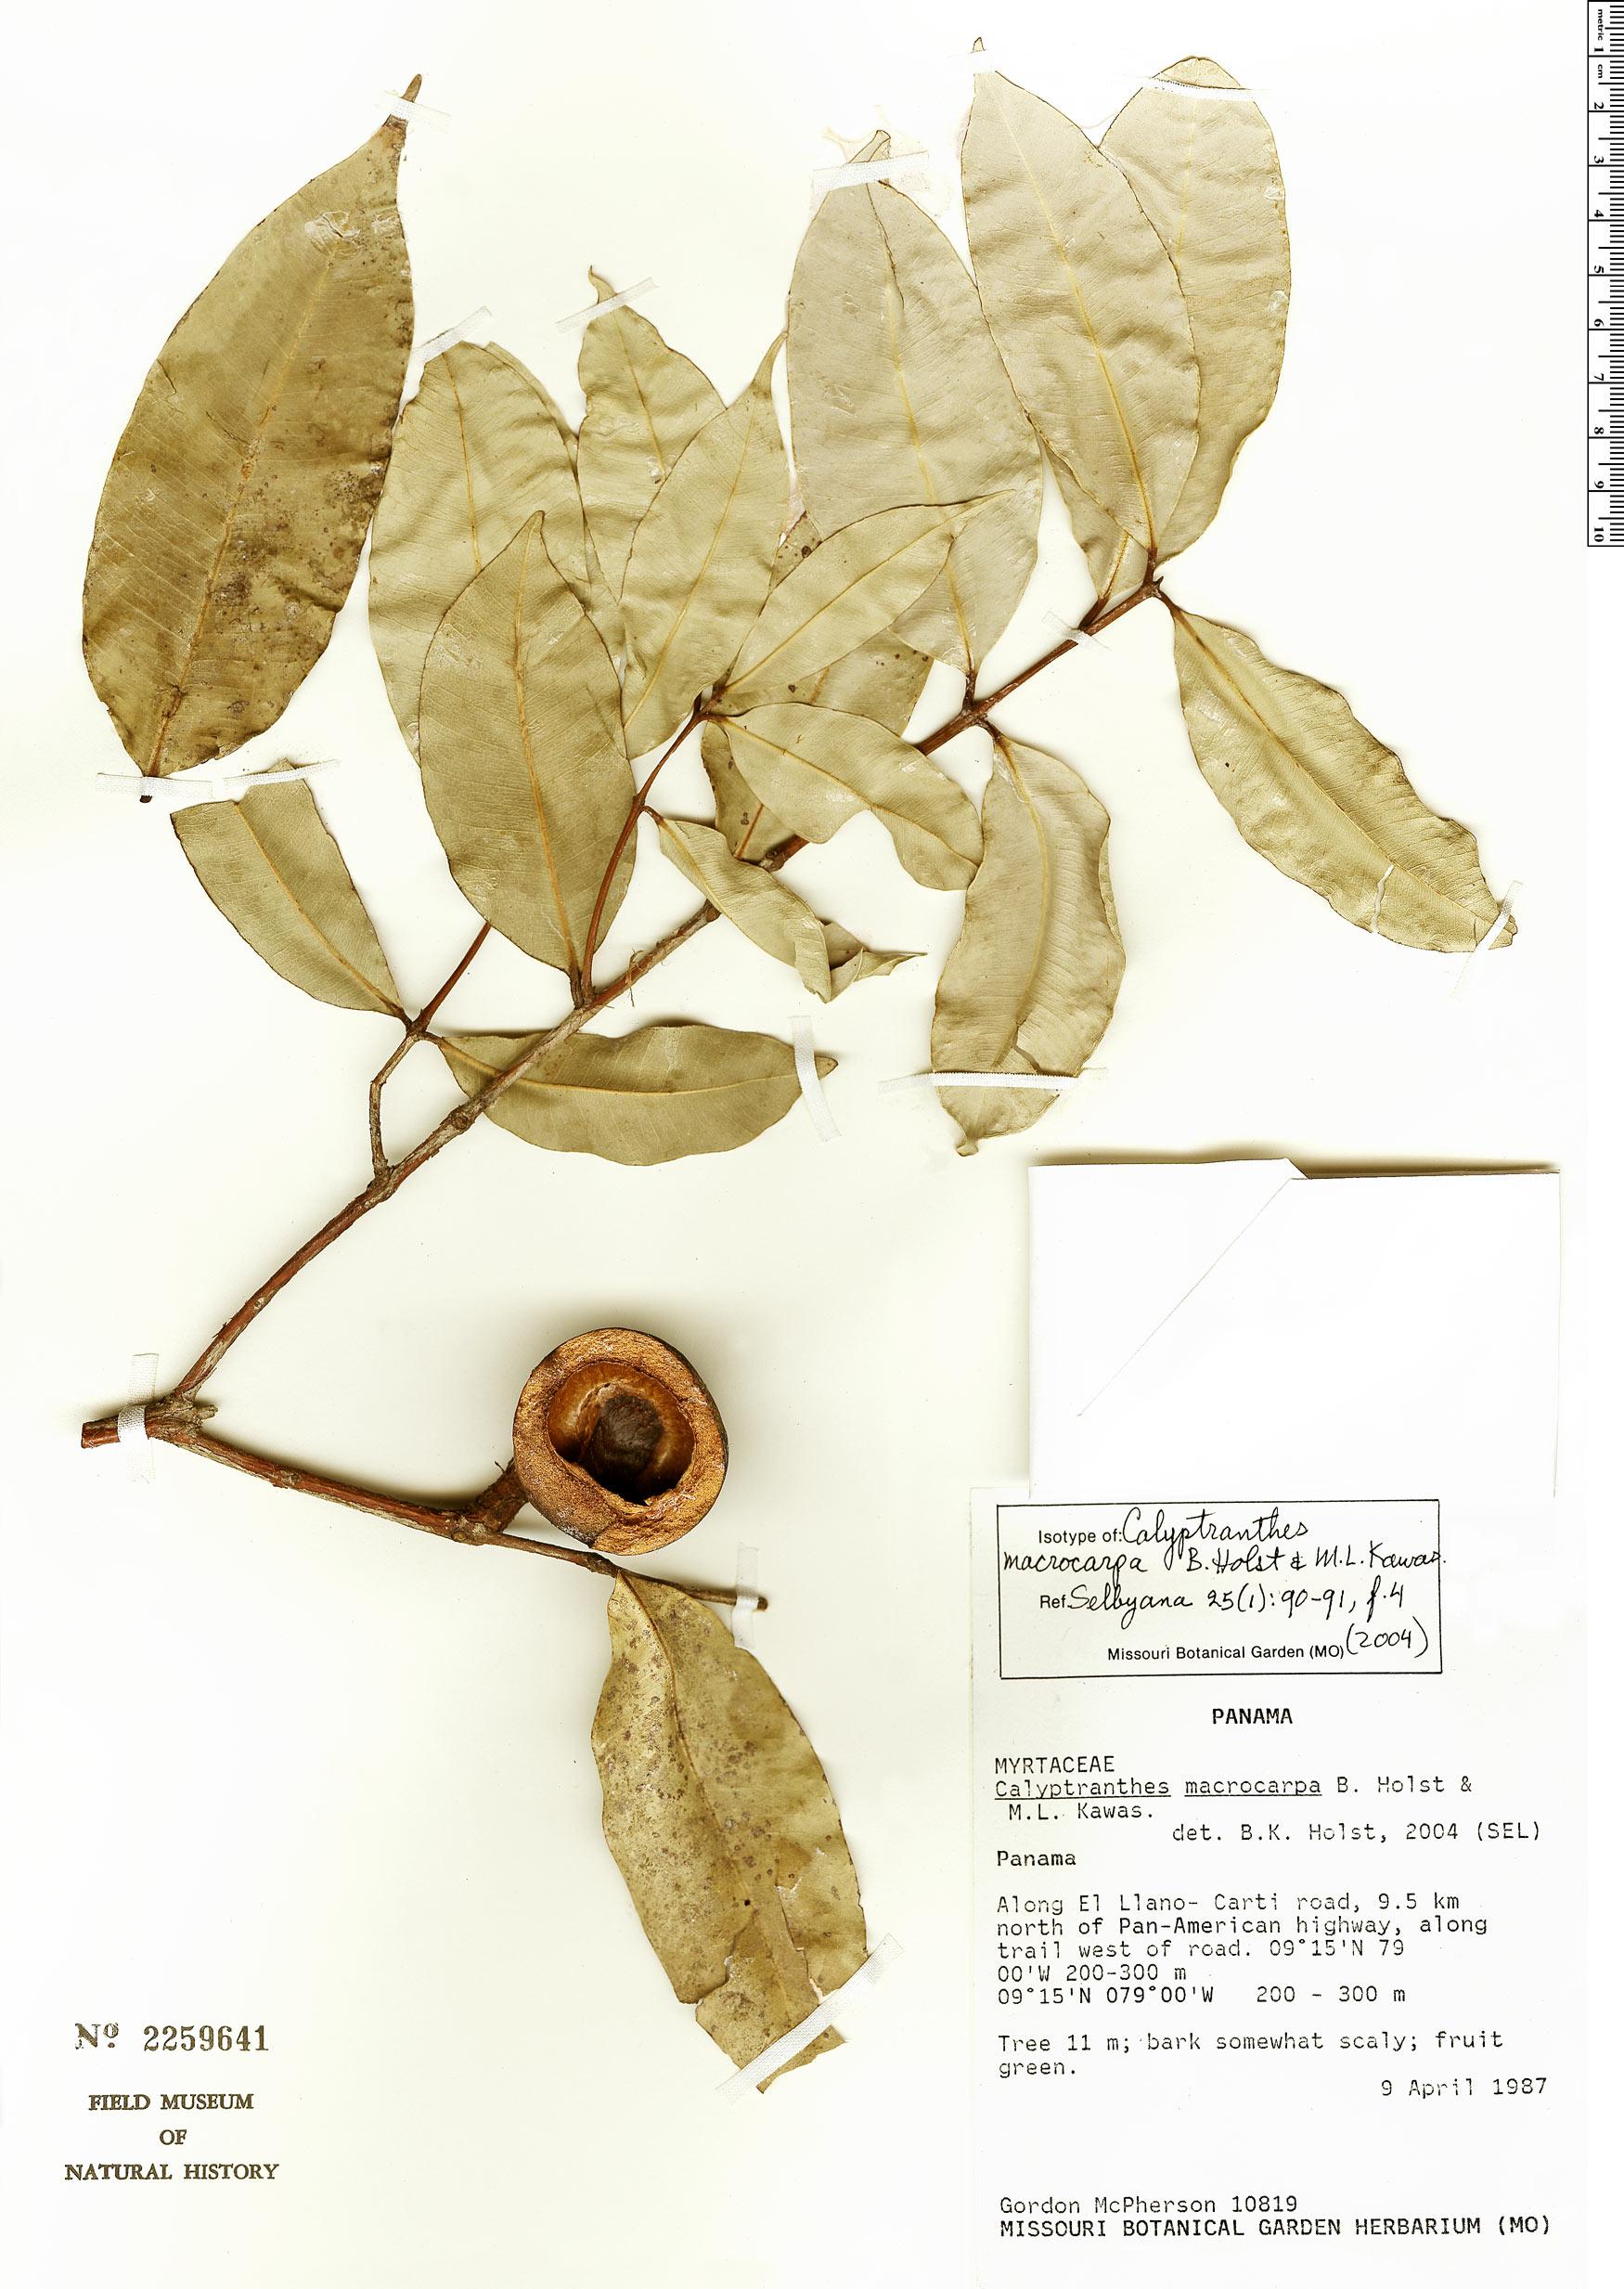 Specimen: Calyptranthes macrocarpa